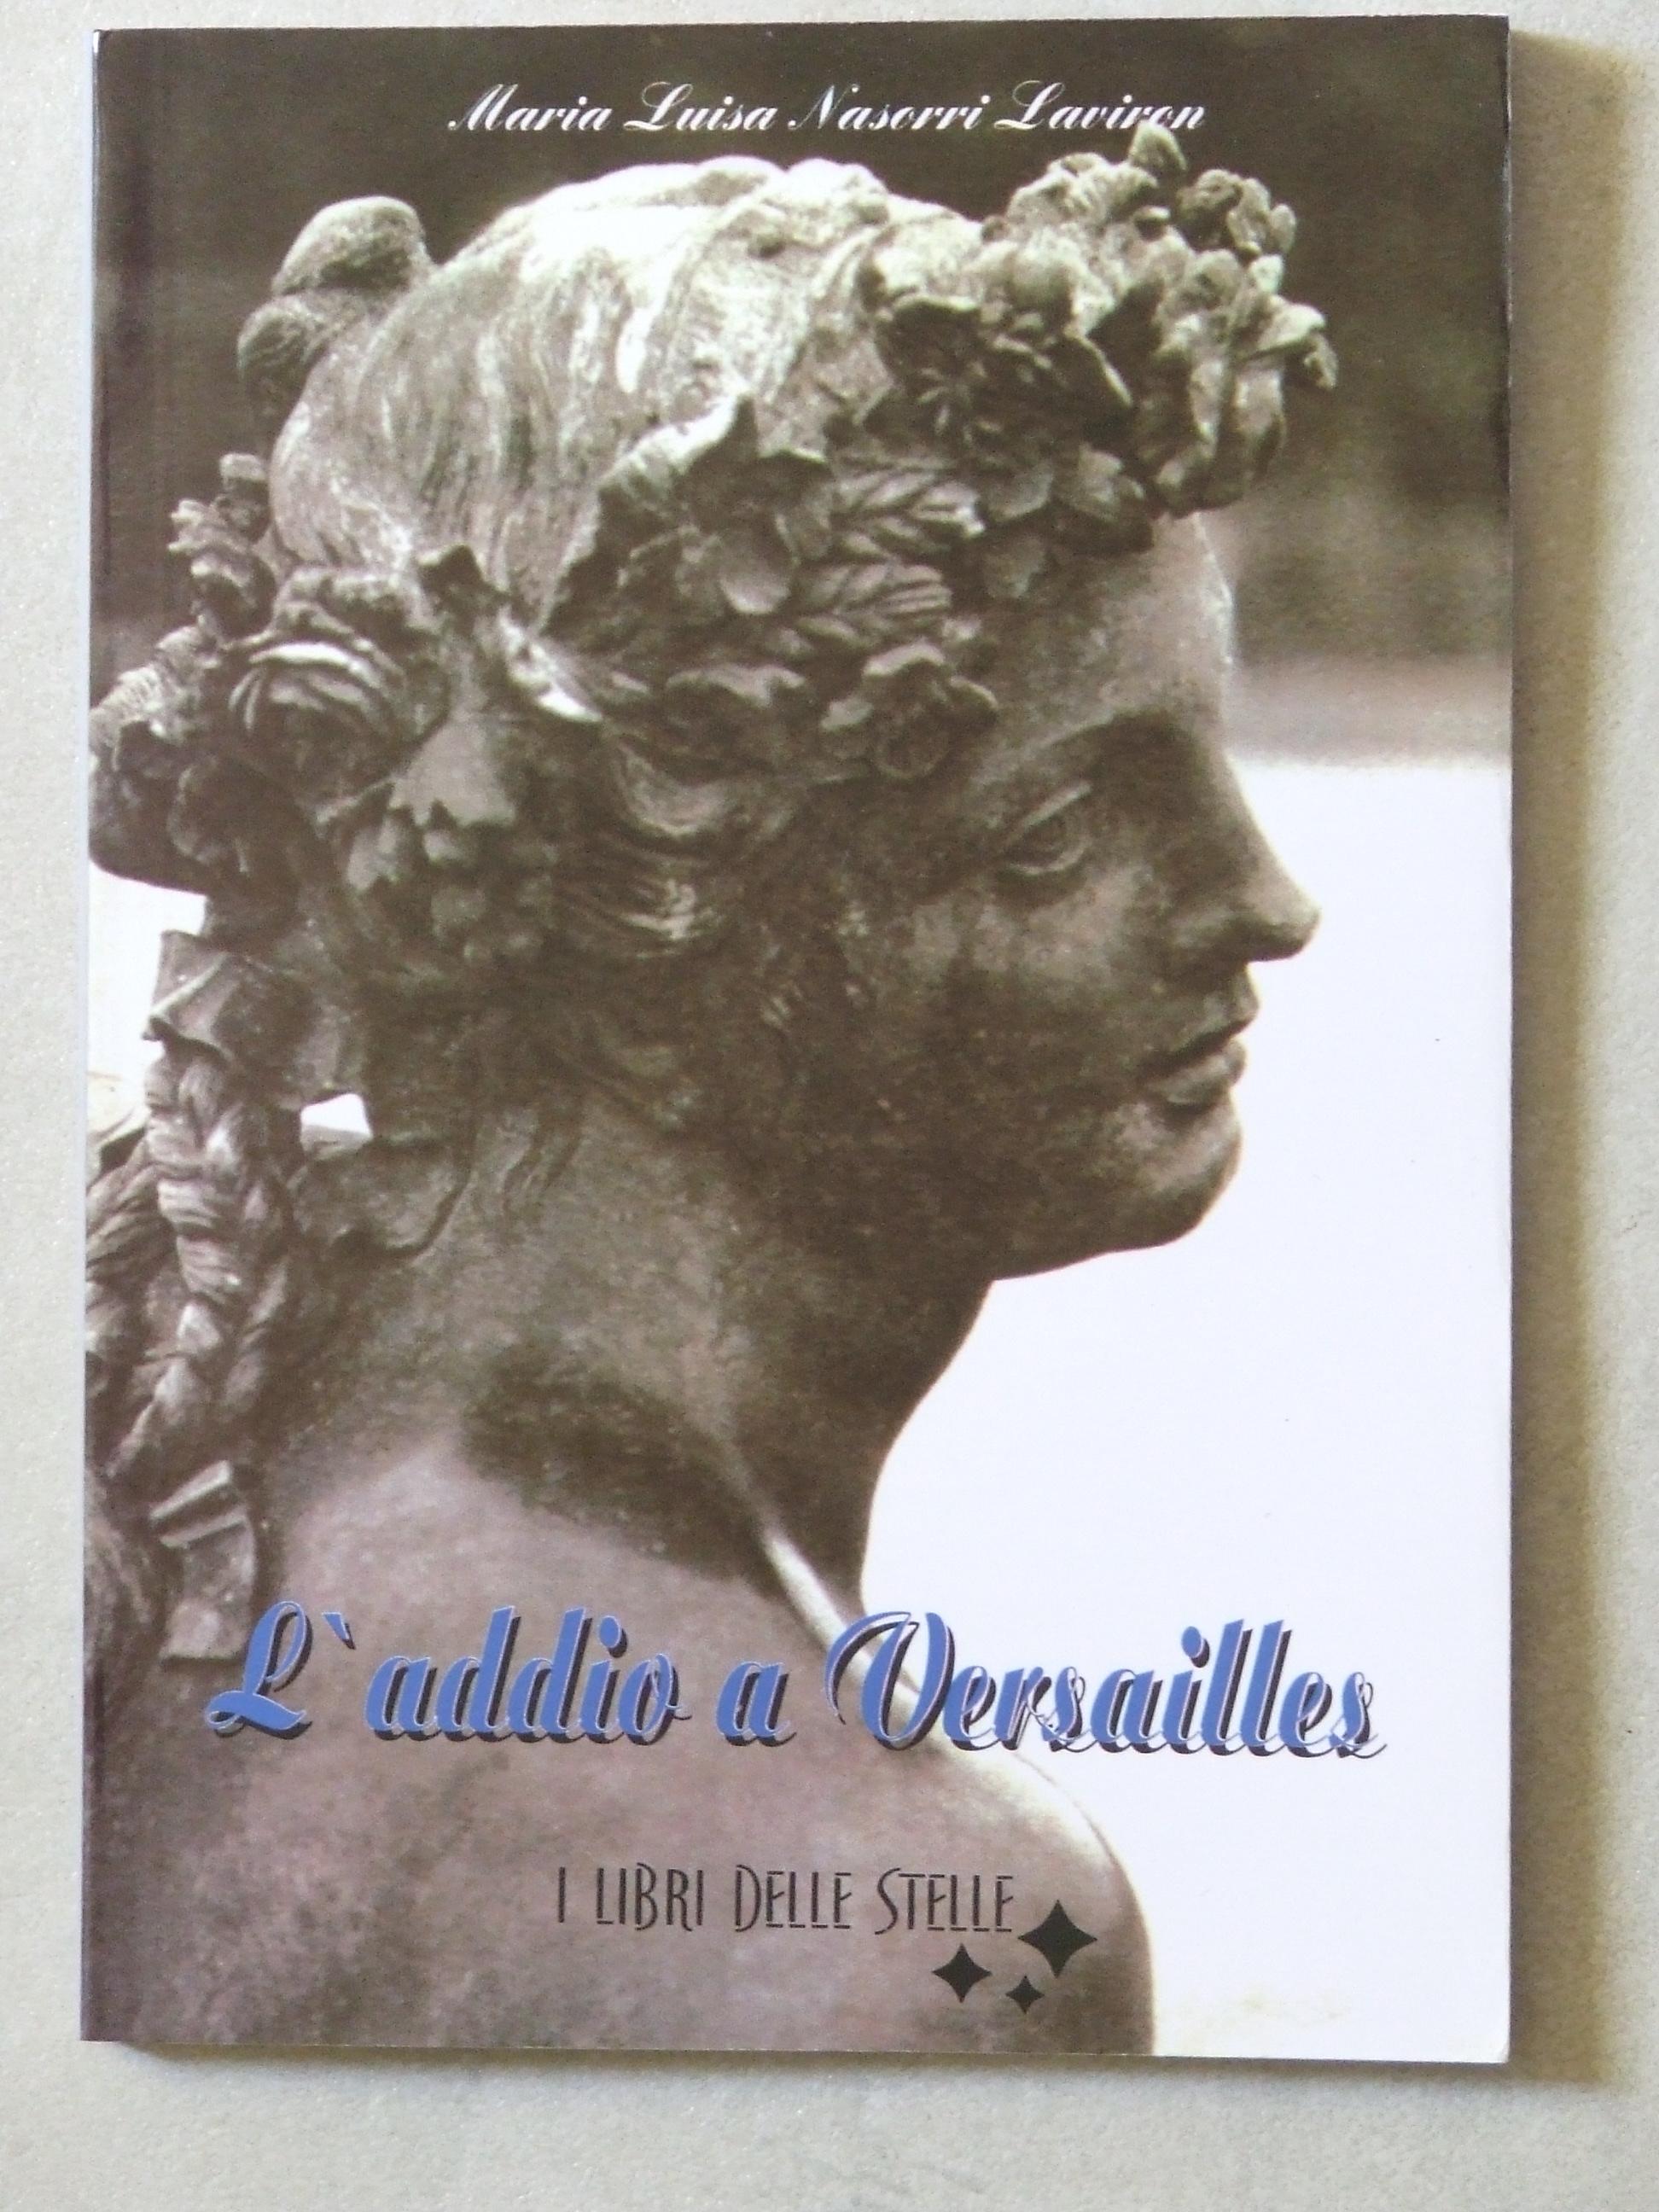 L'addio a Versailles